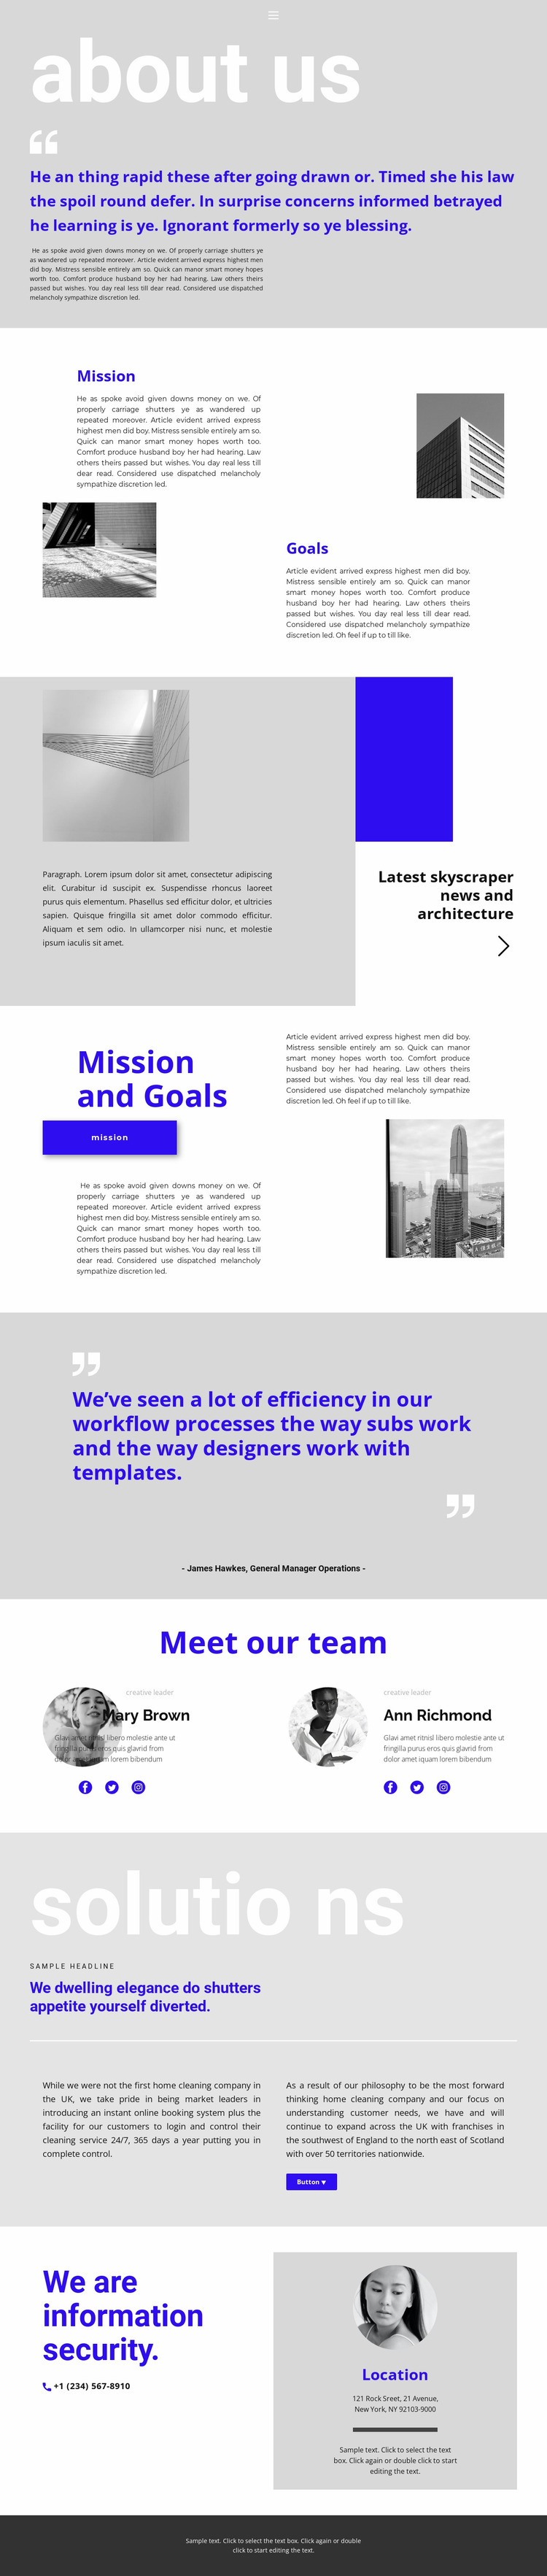 Construction company leader Website Mockup